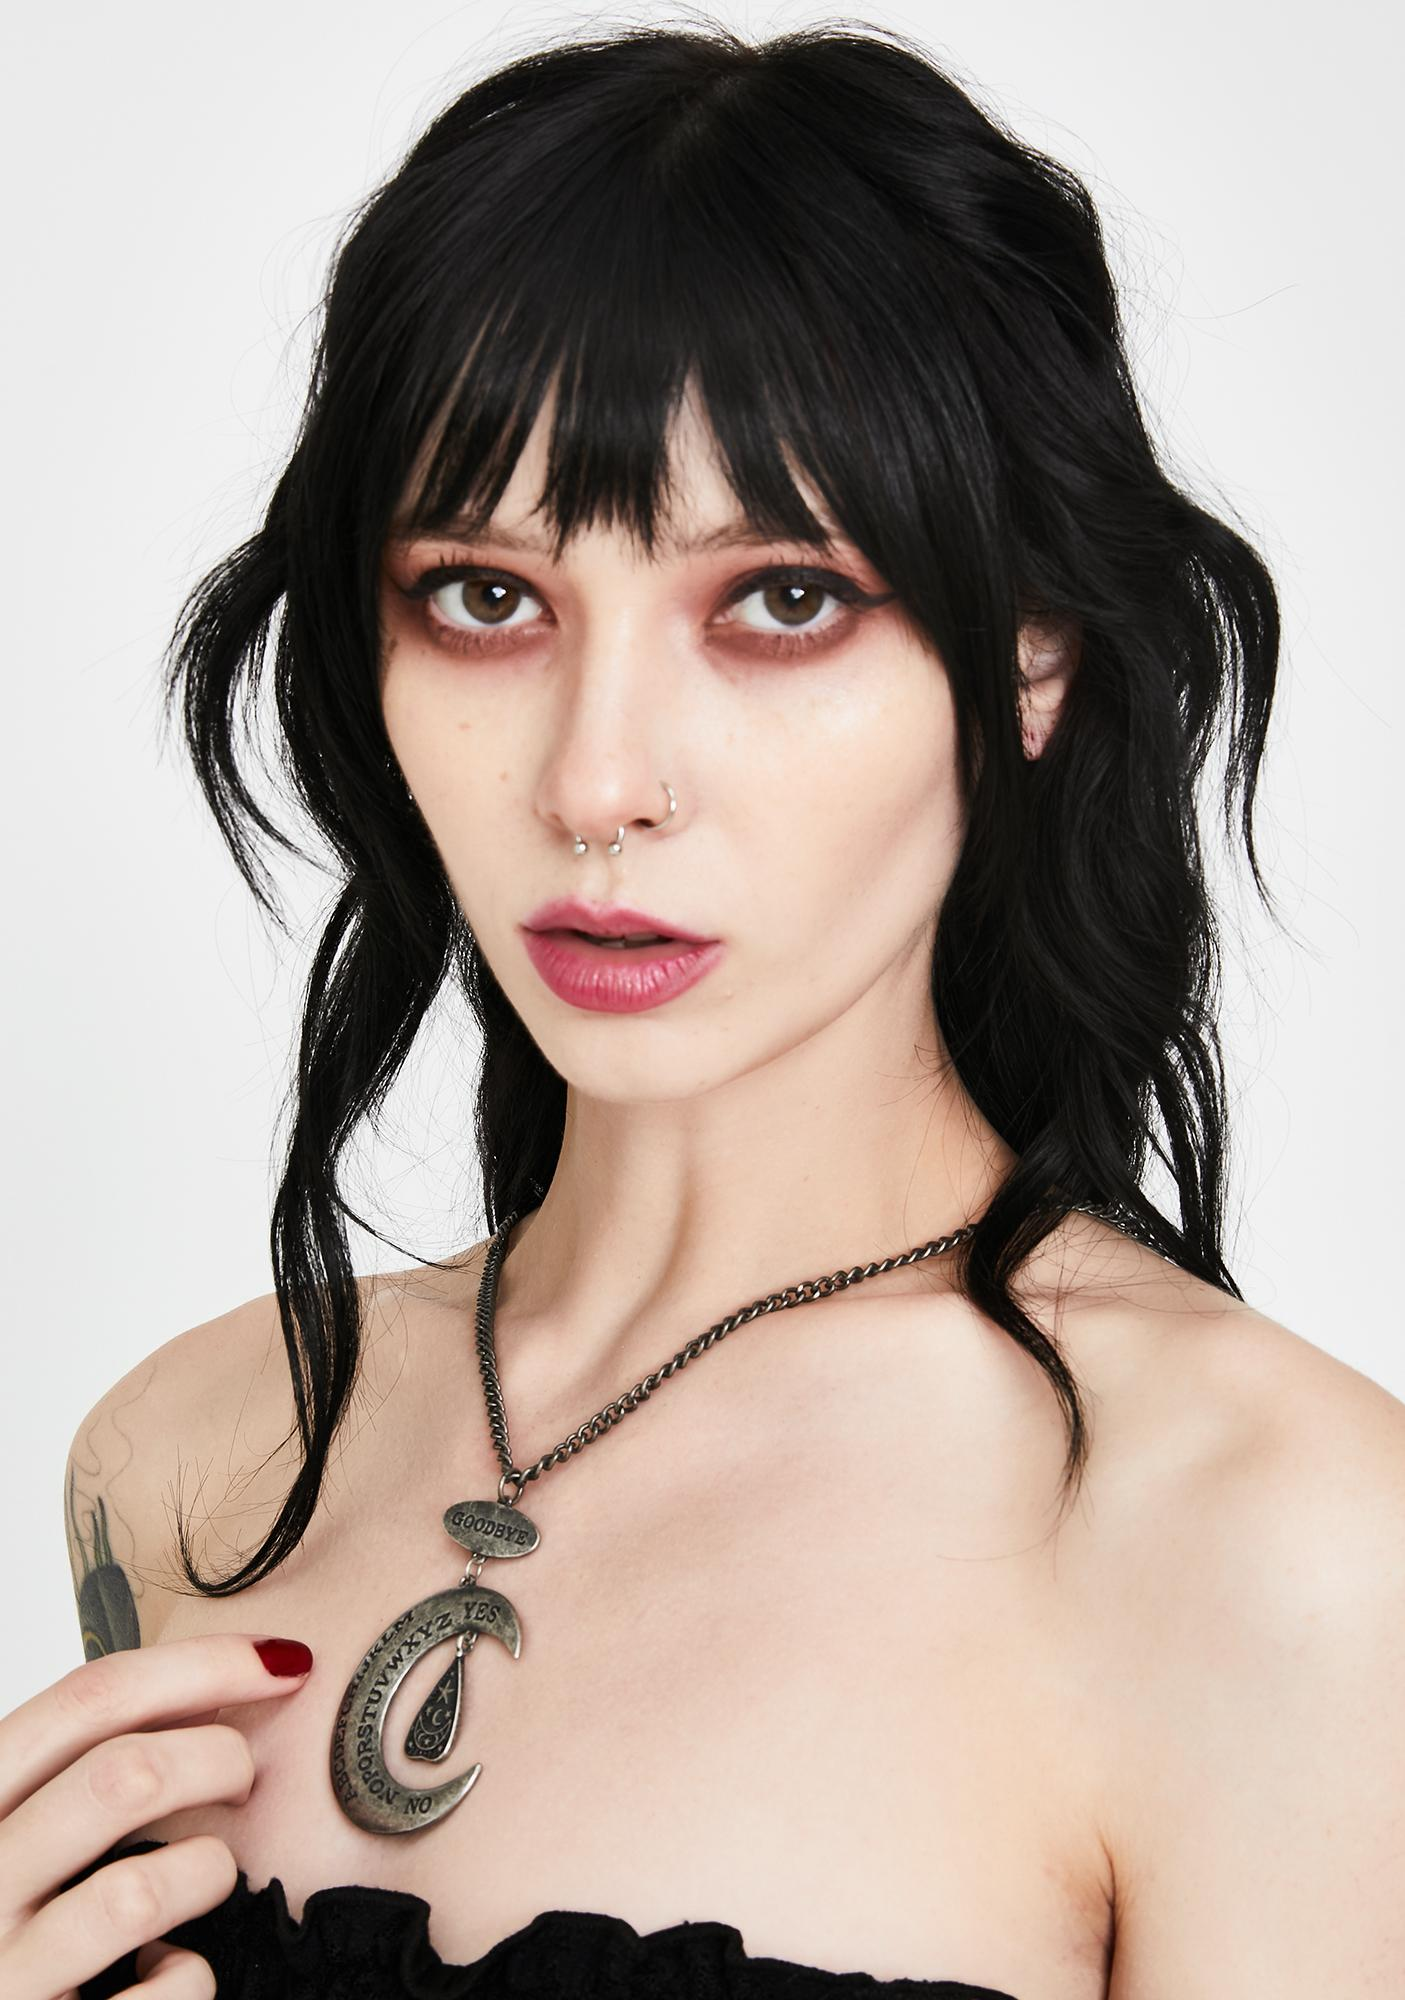 Wicked Insight Ouija Necklace